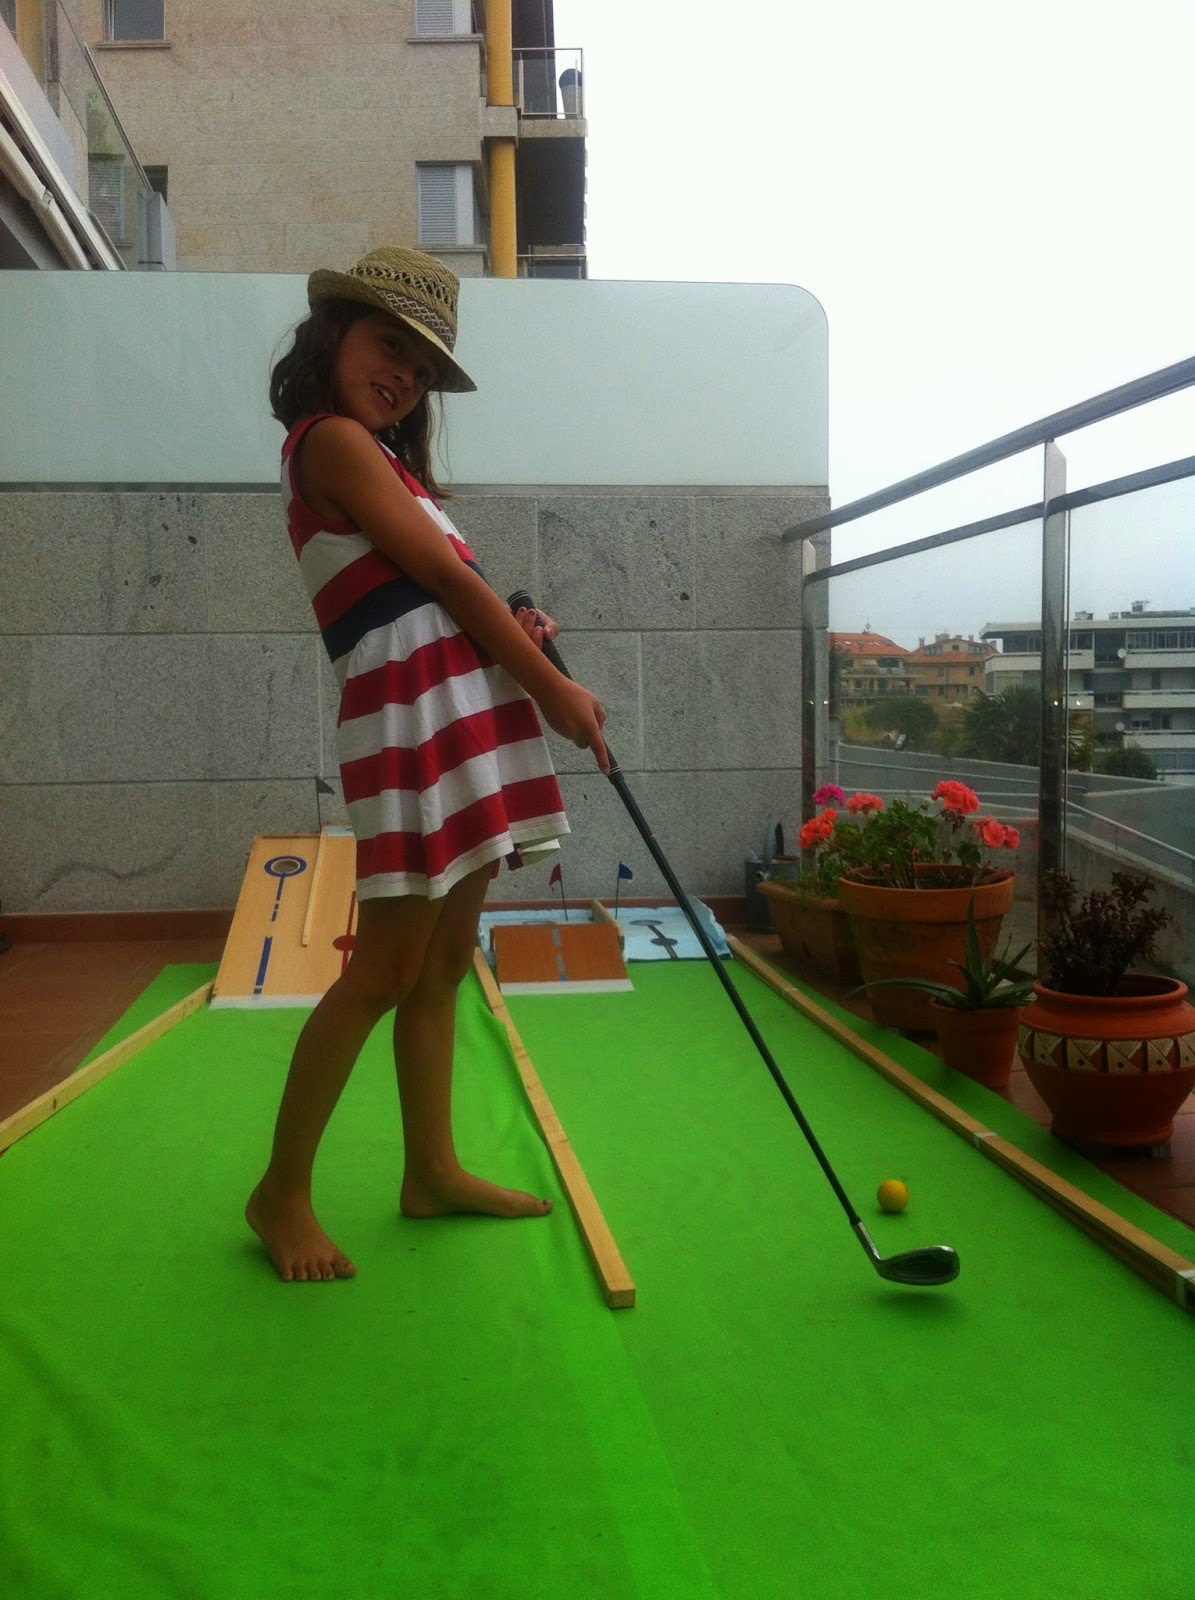 http://sosunnyblog.blogspot.com.es/2013/08/mini-mini-golf.html